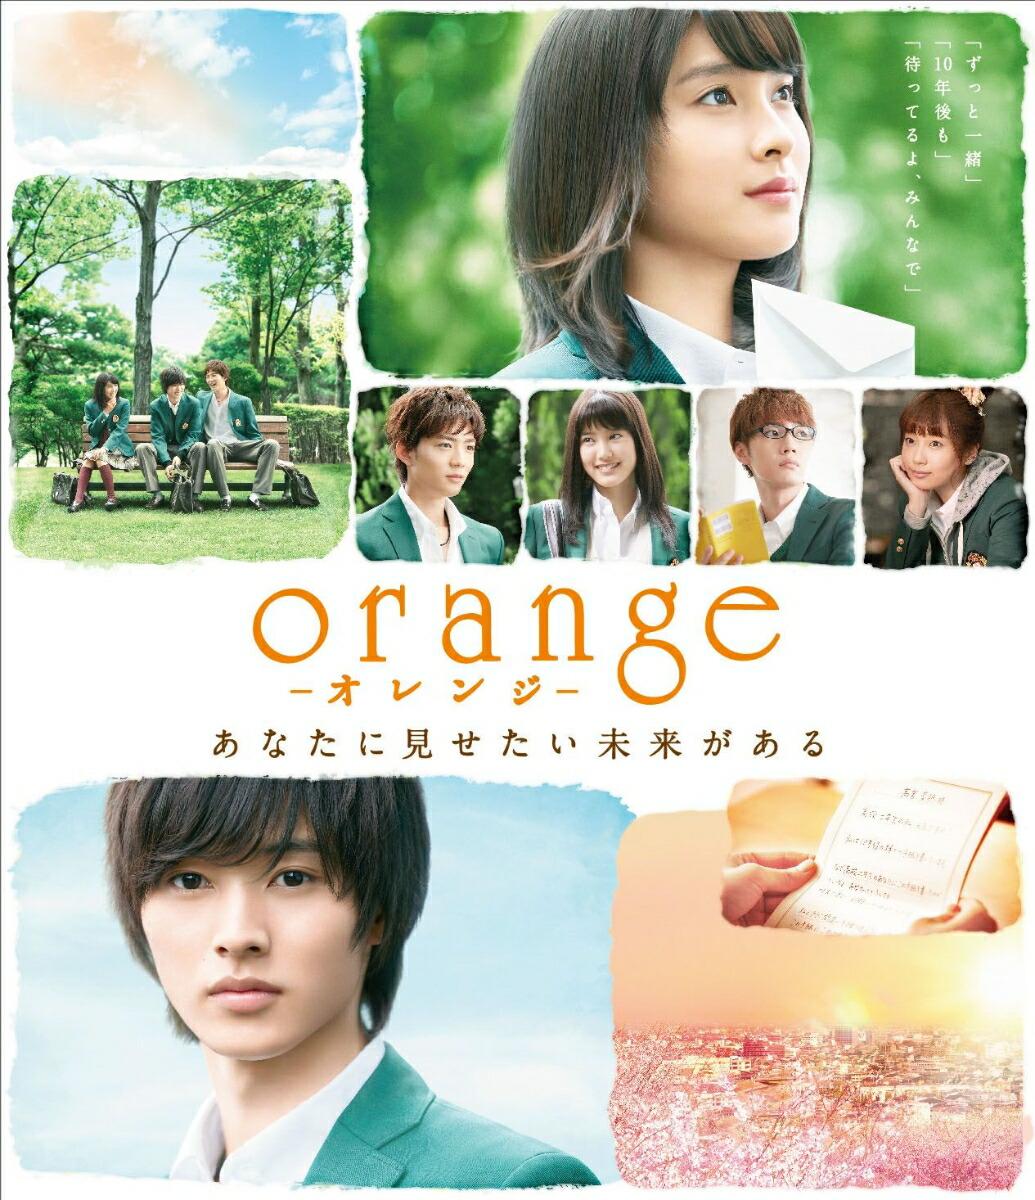 orange-オレンジ- Blu-ray通常版[TBR-26126D][Blu-ray/ブルーレイ] 製品画像